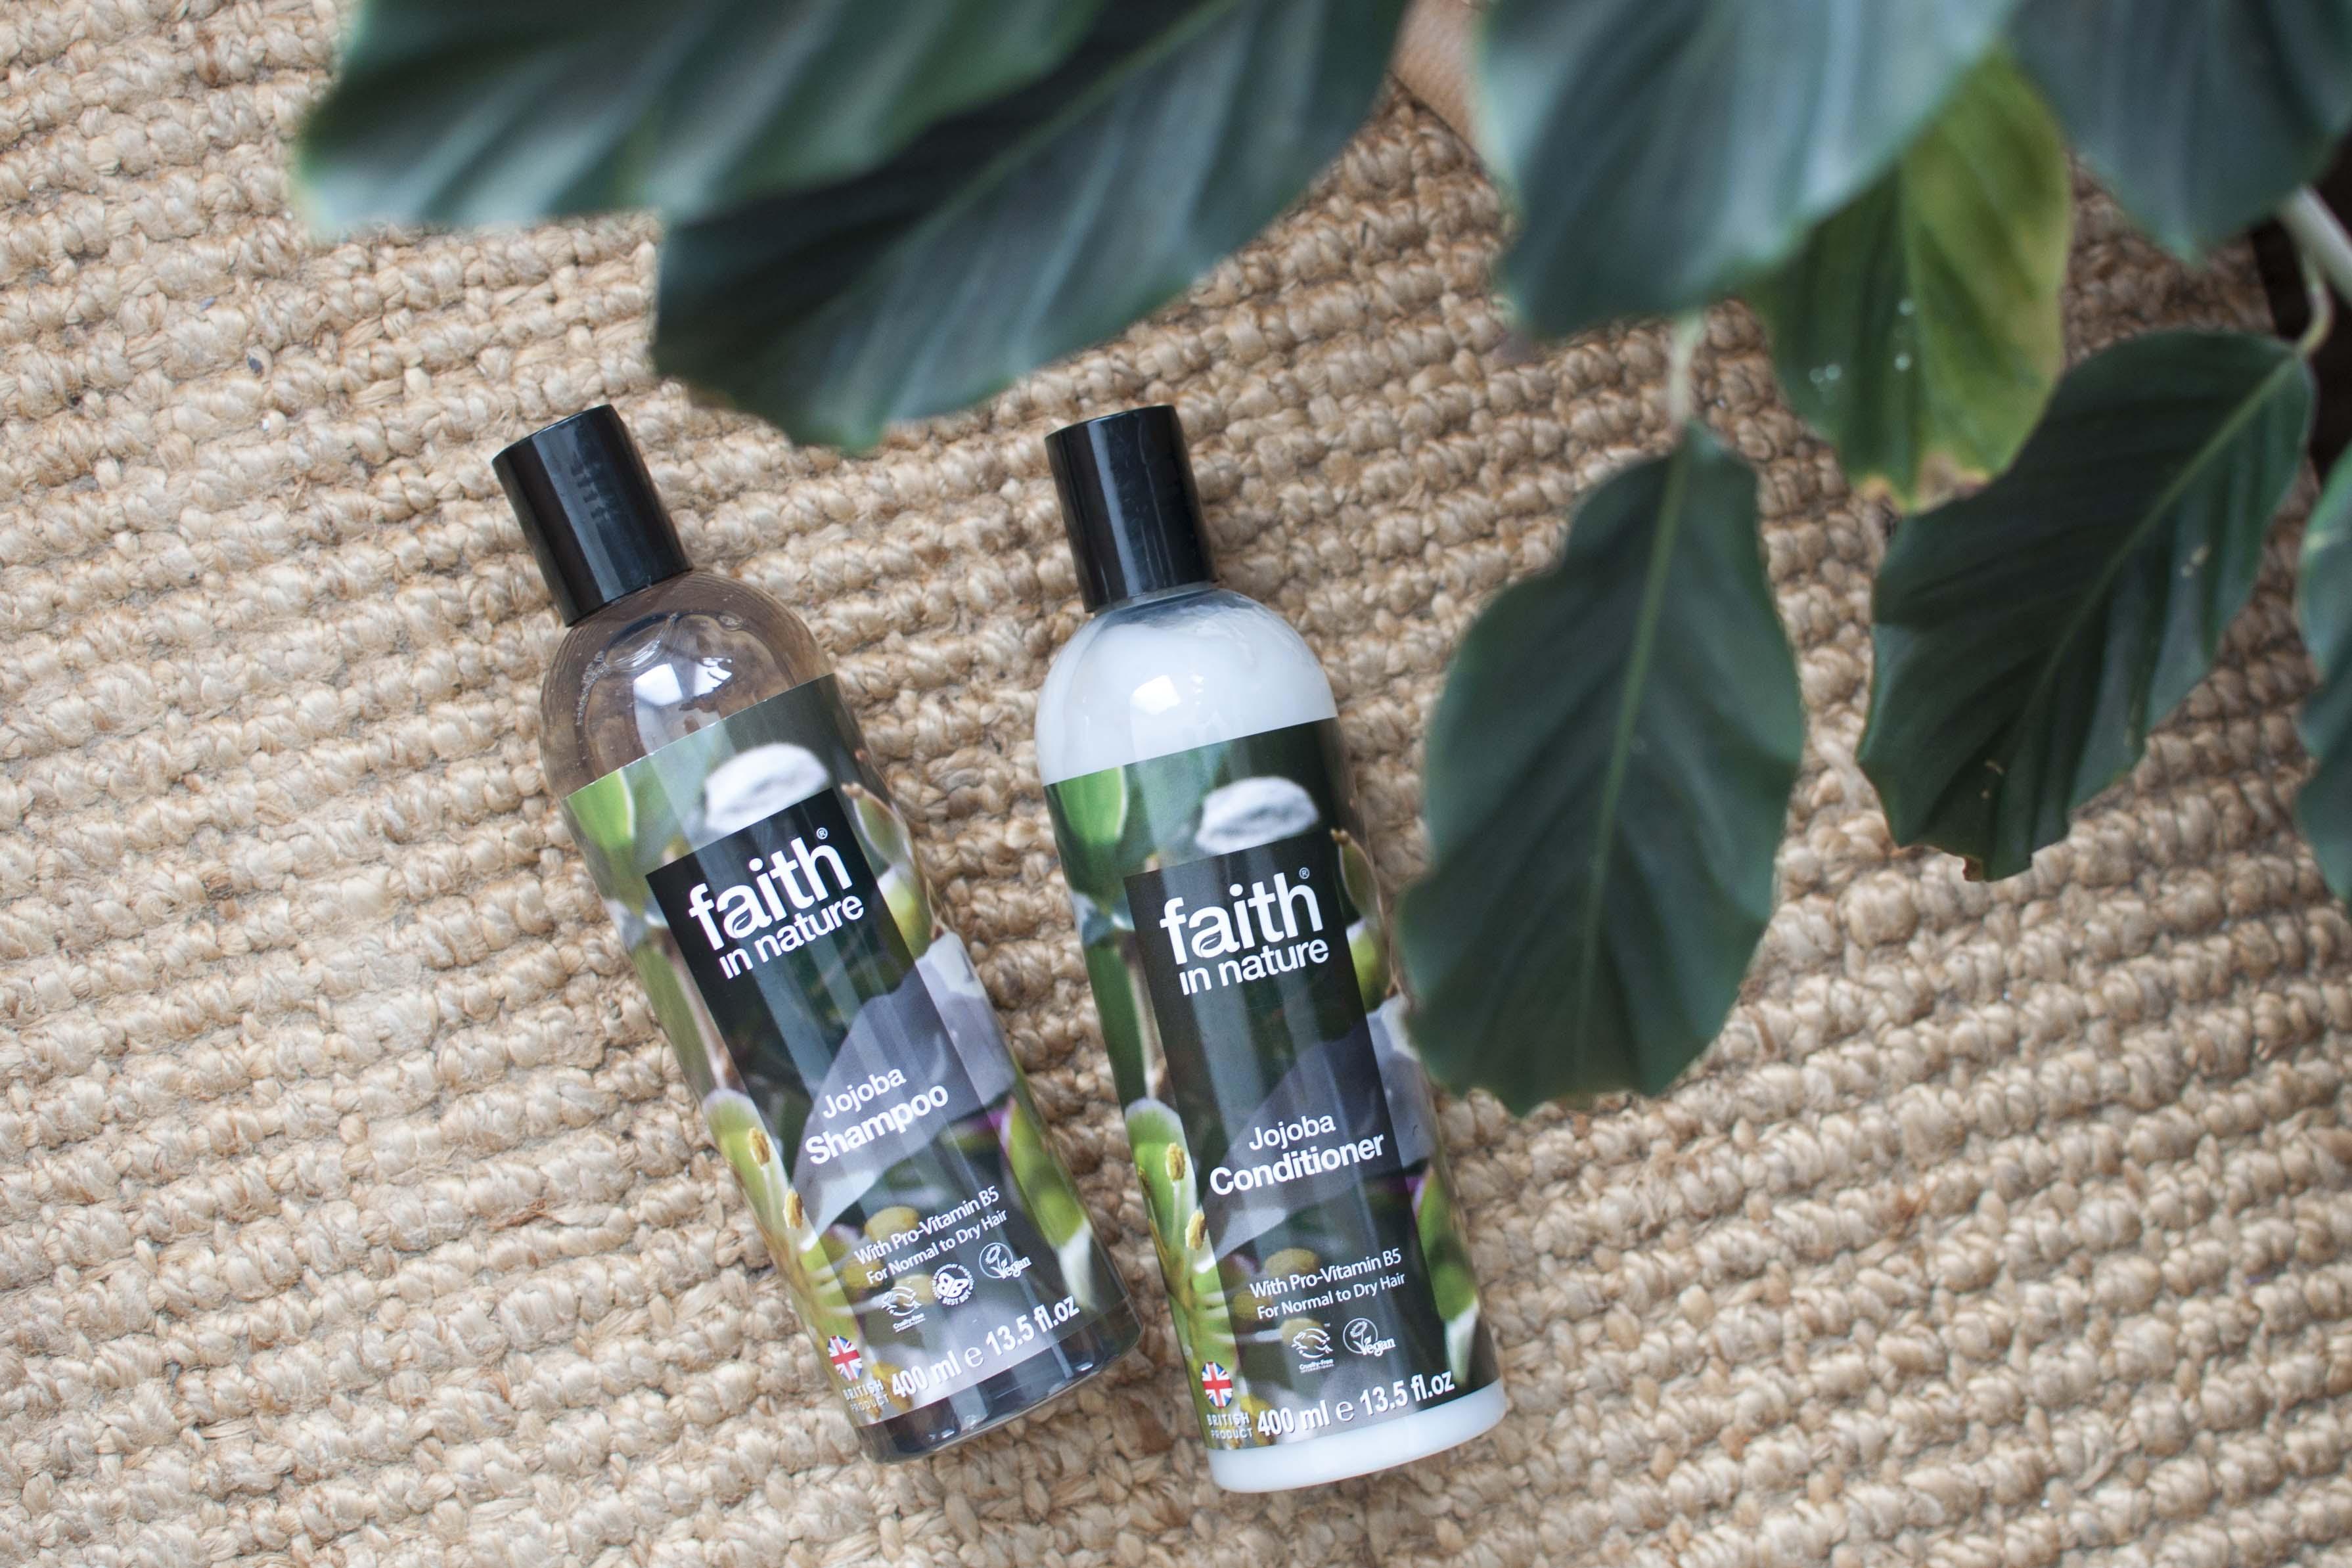 review faith in nature jojoba shampoo conditioner